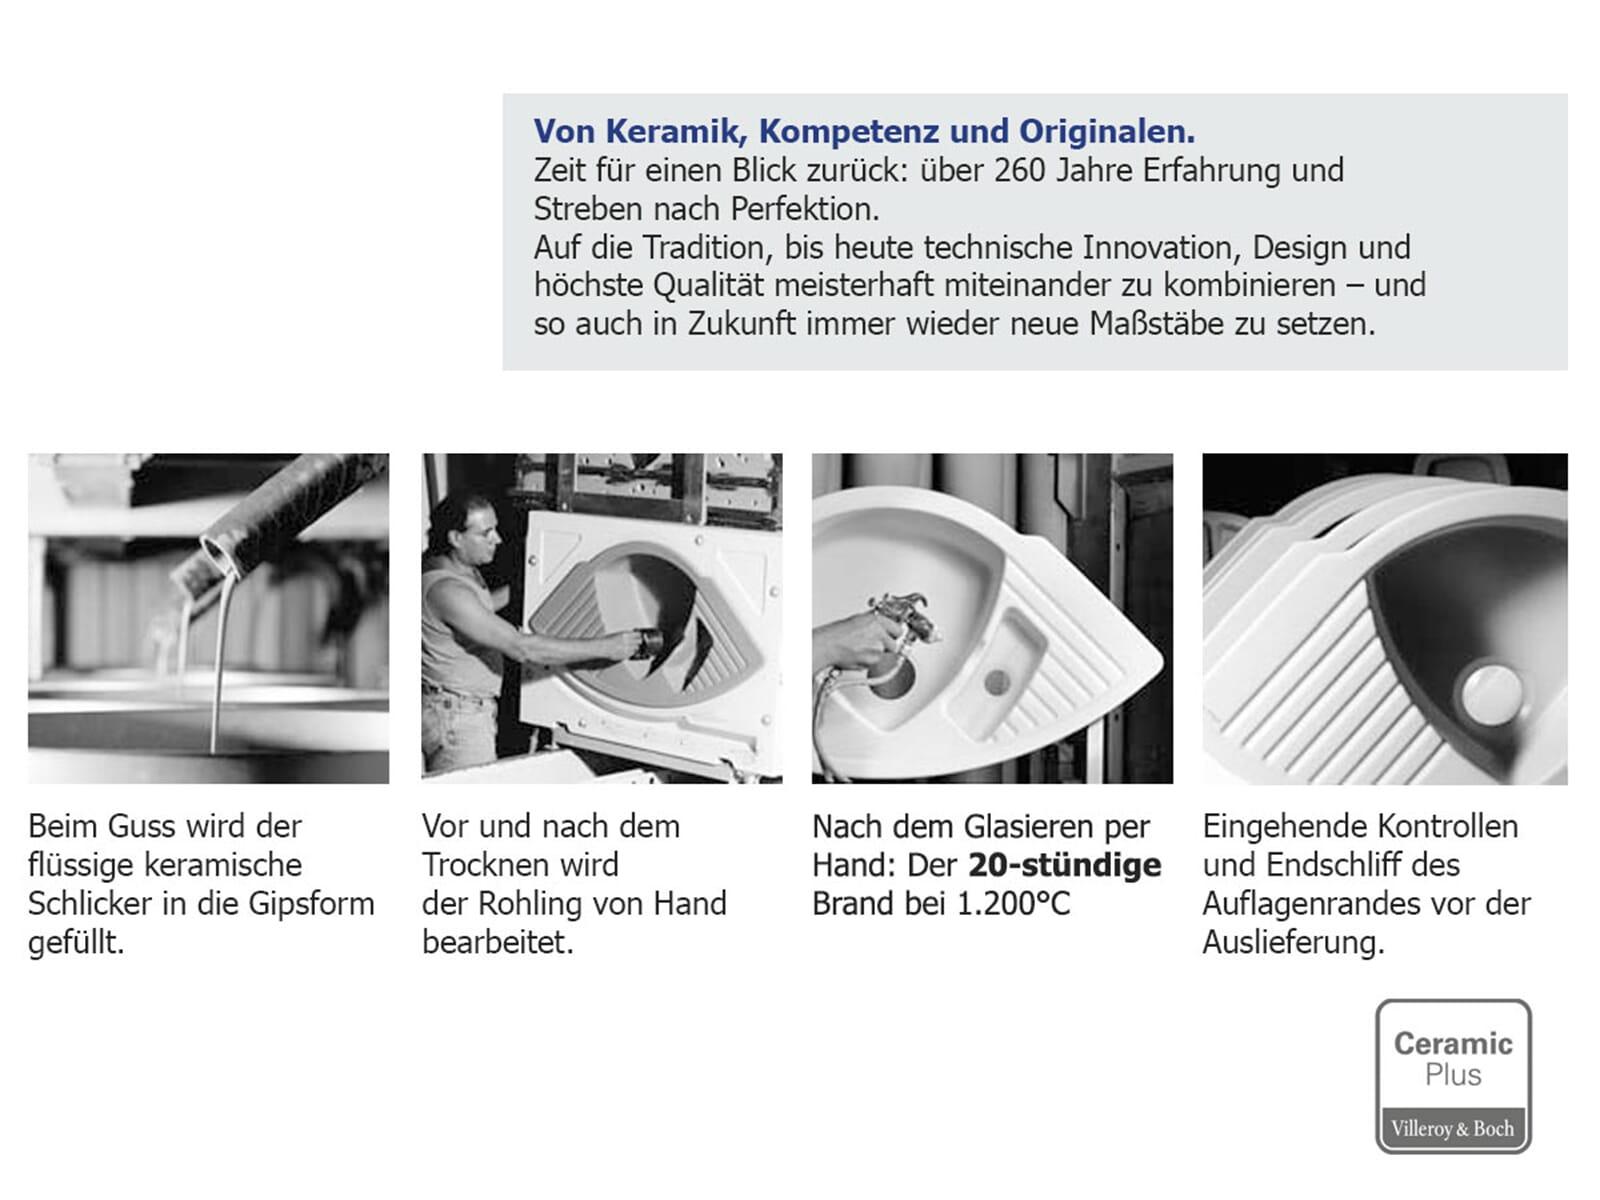 Villeroy & Boch Flavia 60 Edelweiss - 3304 01 S3 Keramikspüle Handbetätigung